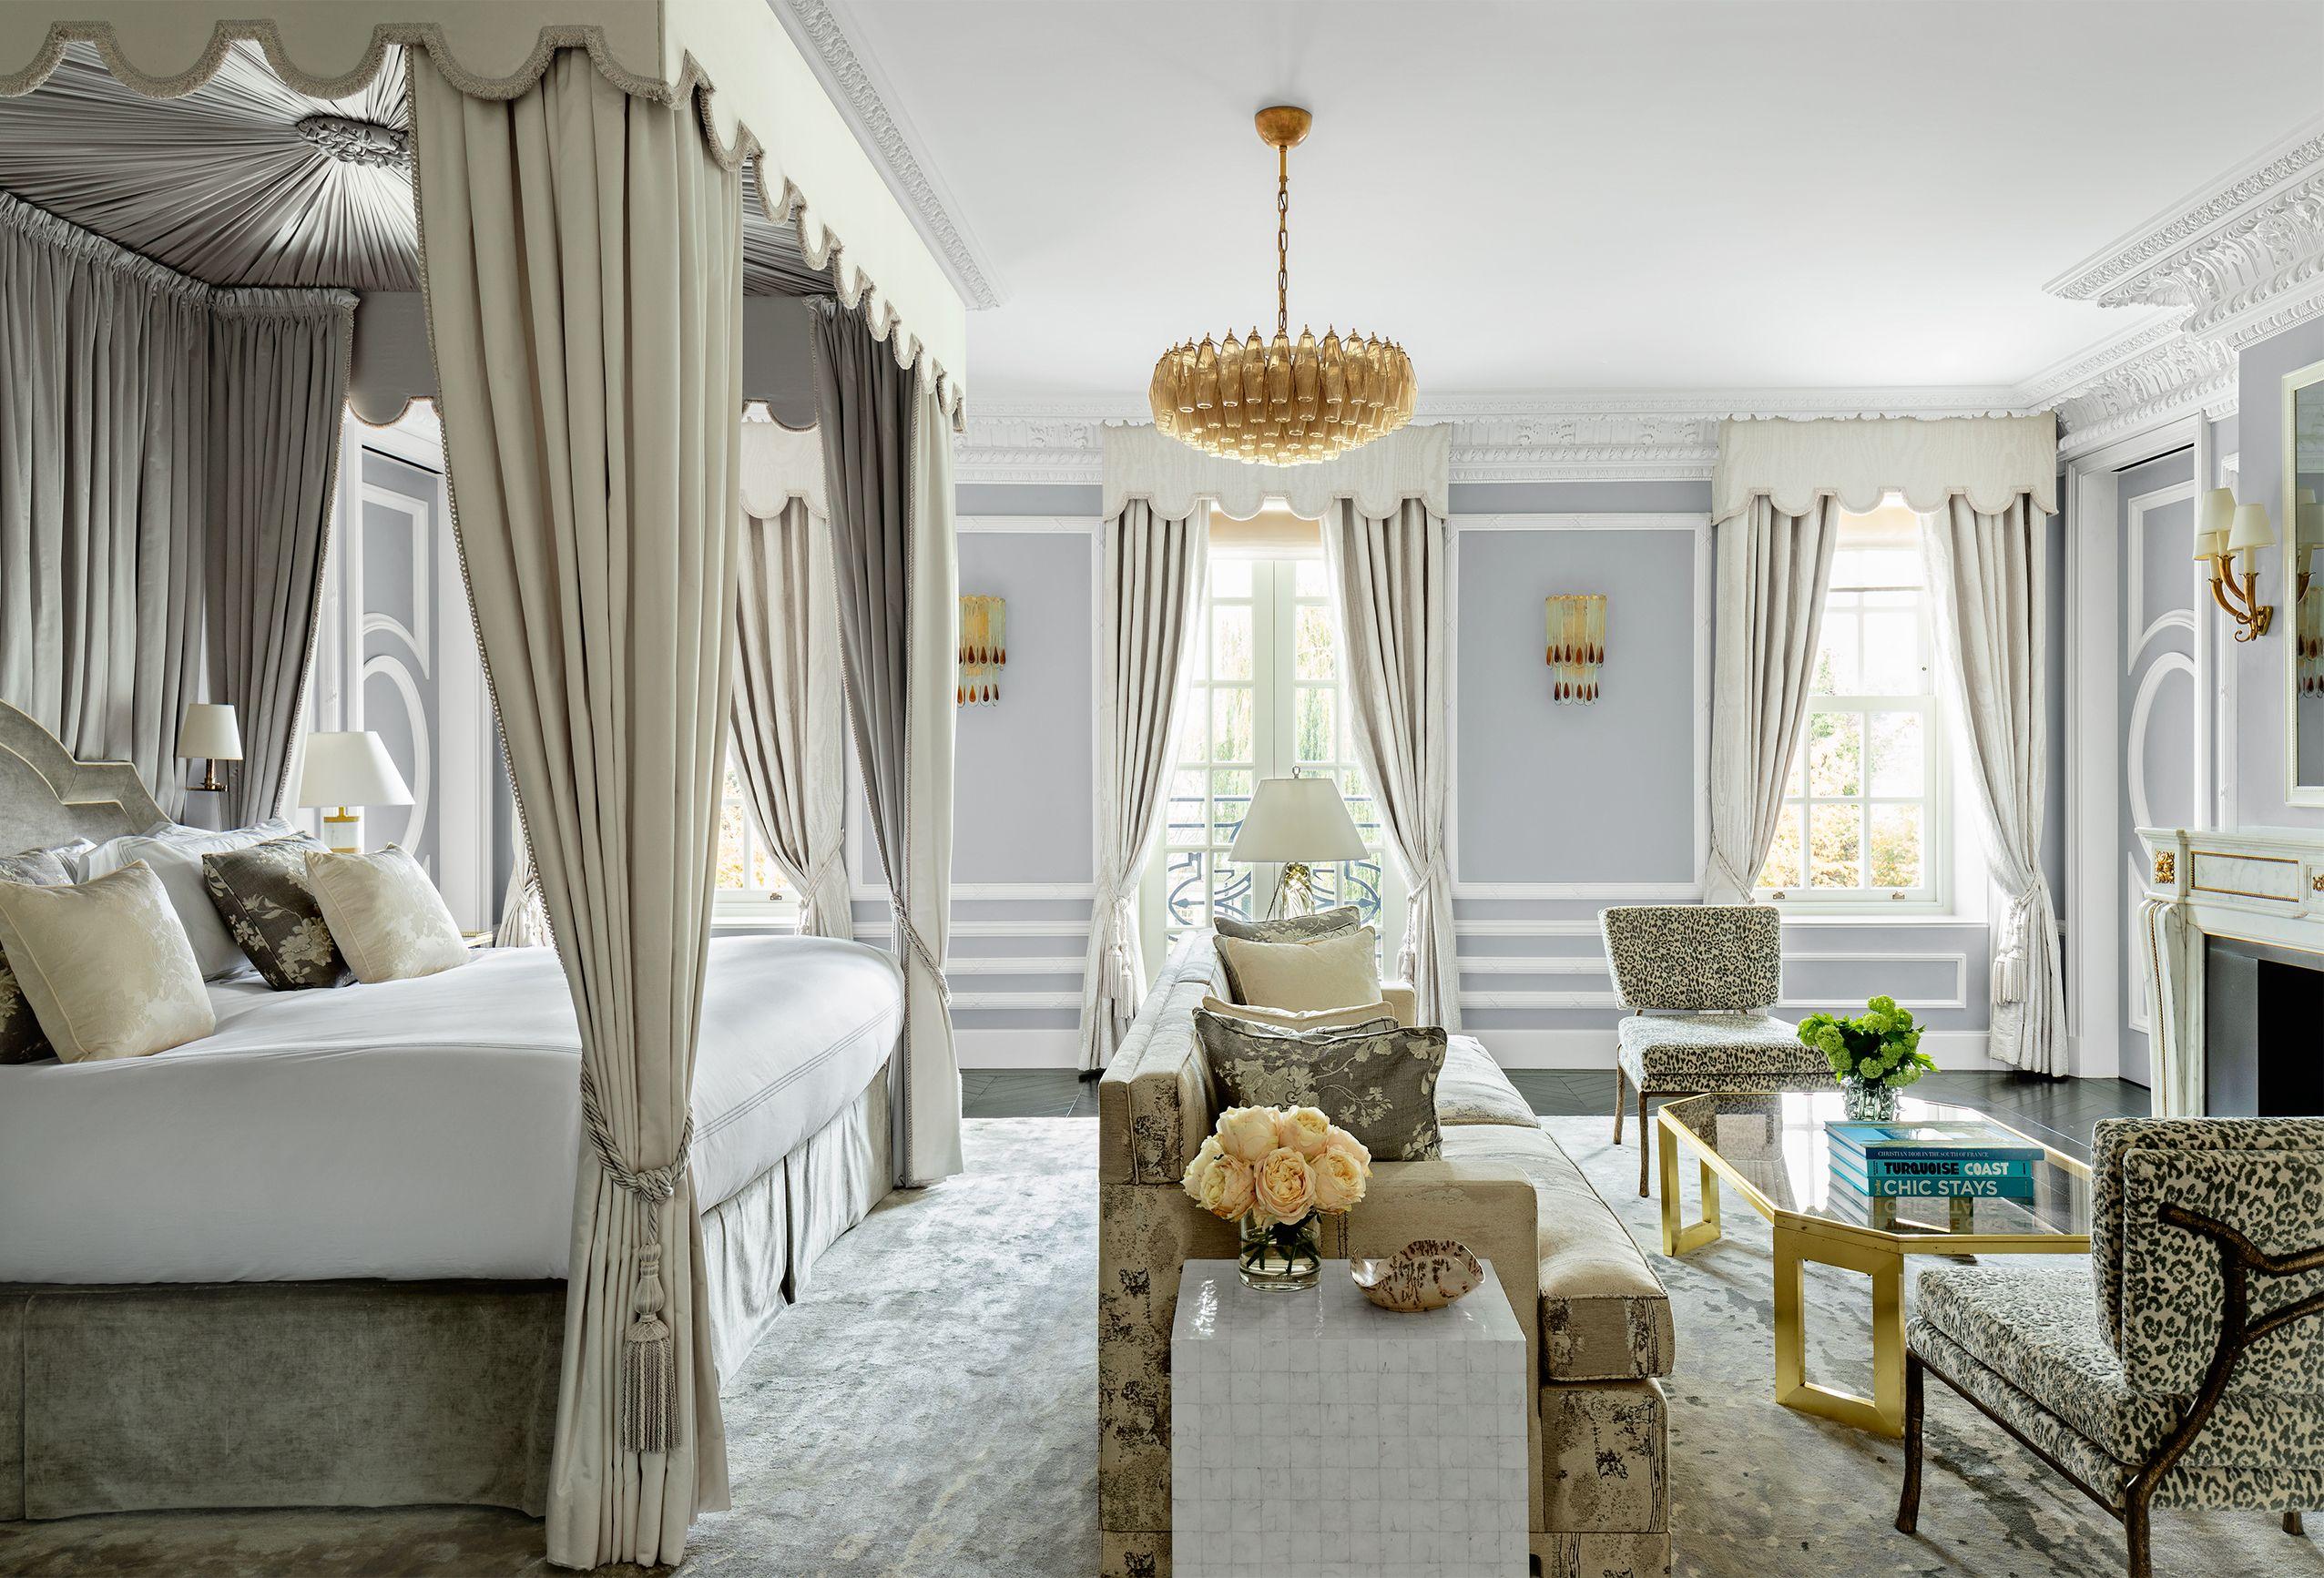 Best Bedroom Curtains - Ideas for Bedroom Window Treatments on Master Bedroom Curtain Ideas  id=52222